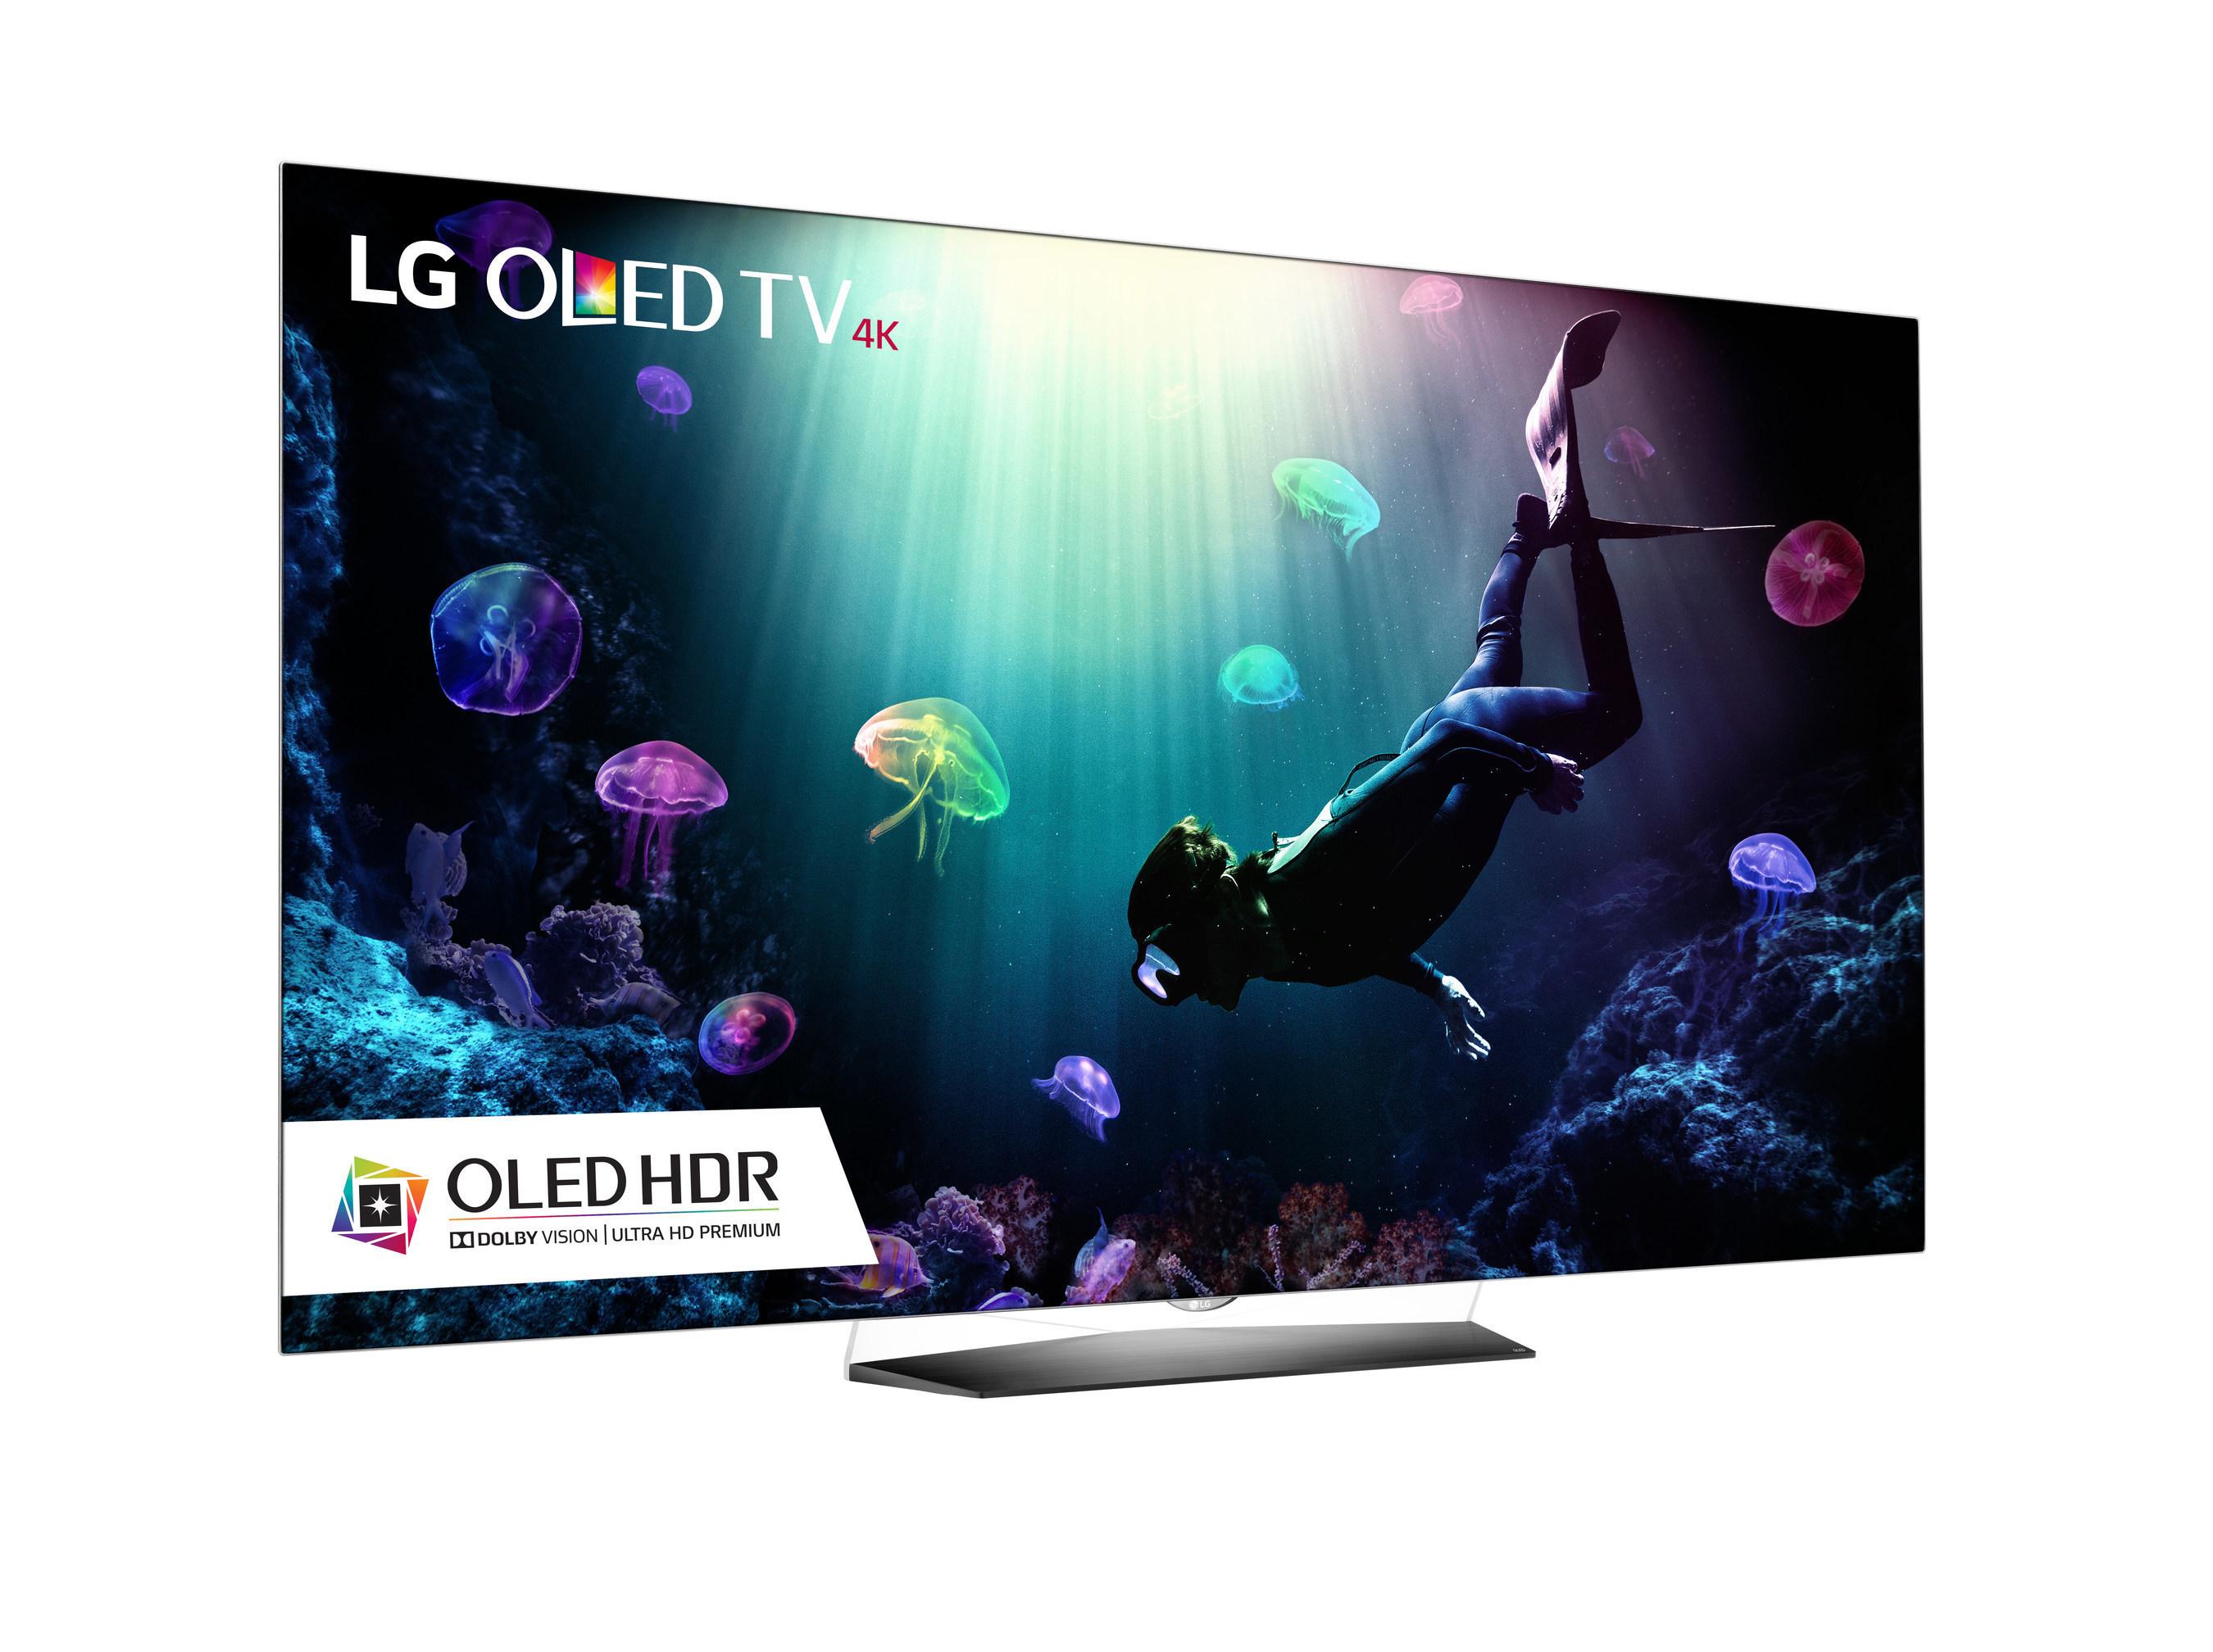 B6P LG OLED 4K TV